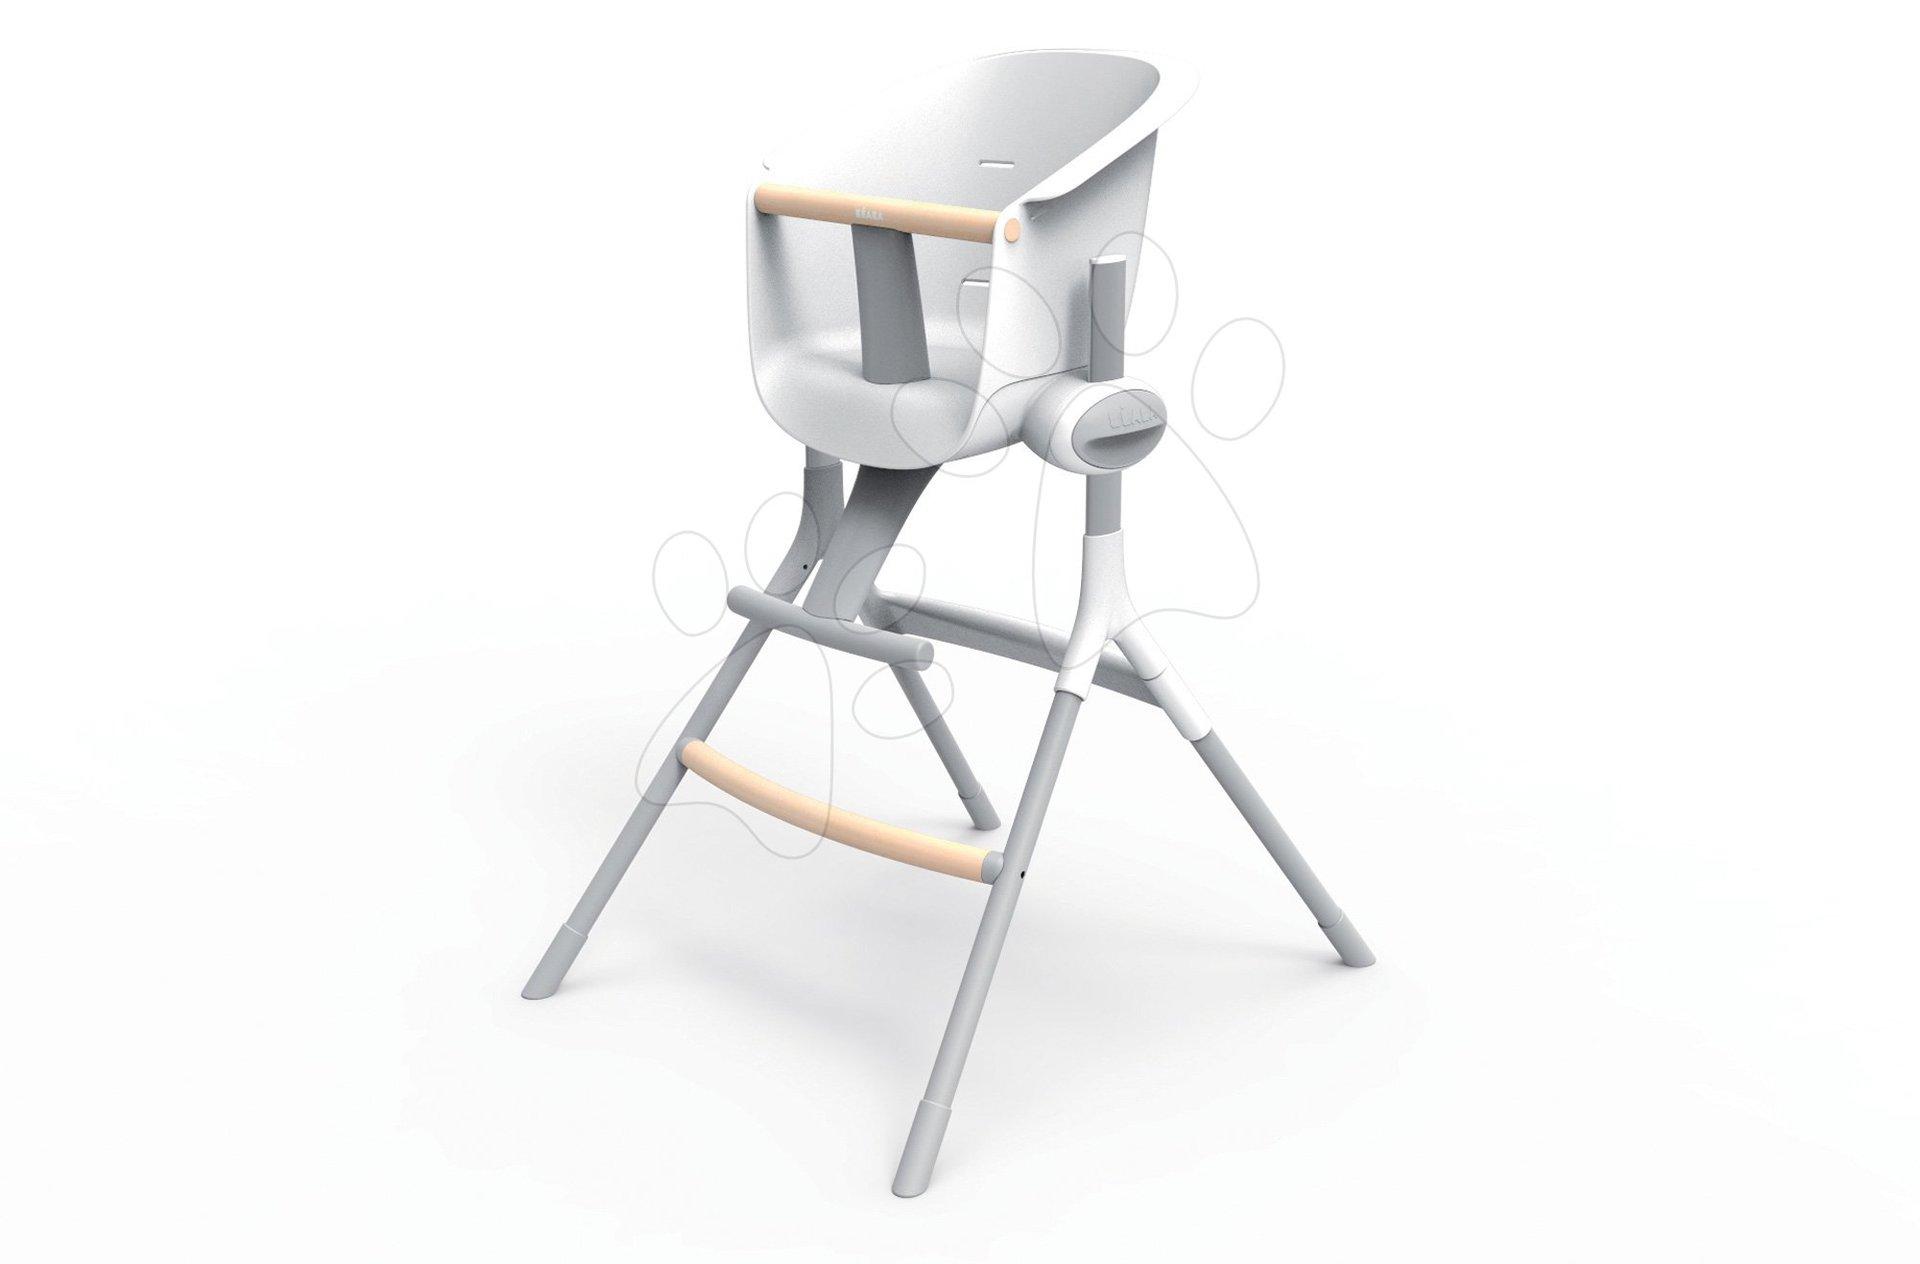 Jedálenská stolička Beaba Up&Down výškovo polohovateľná